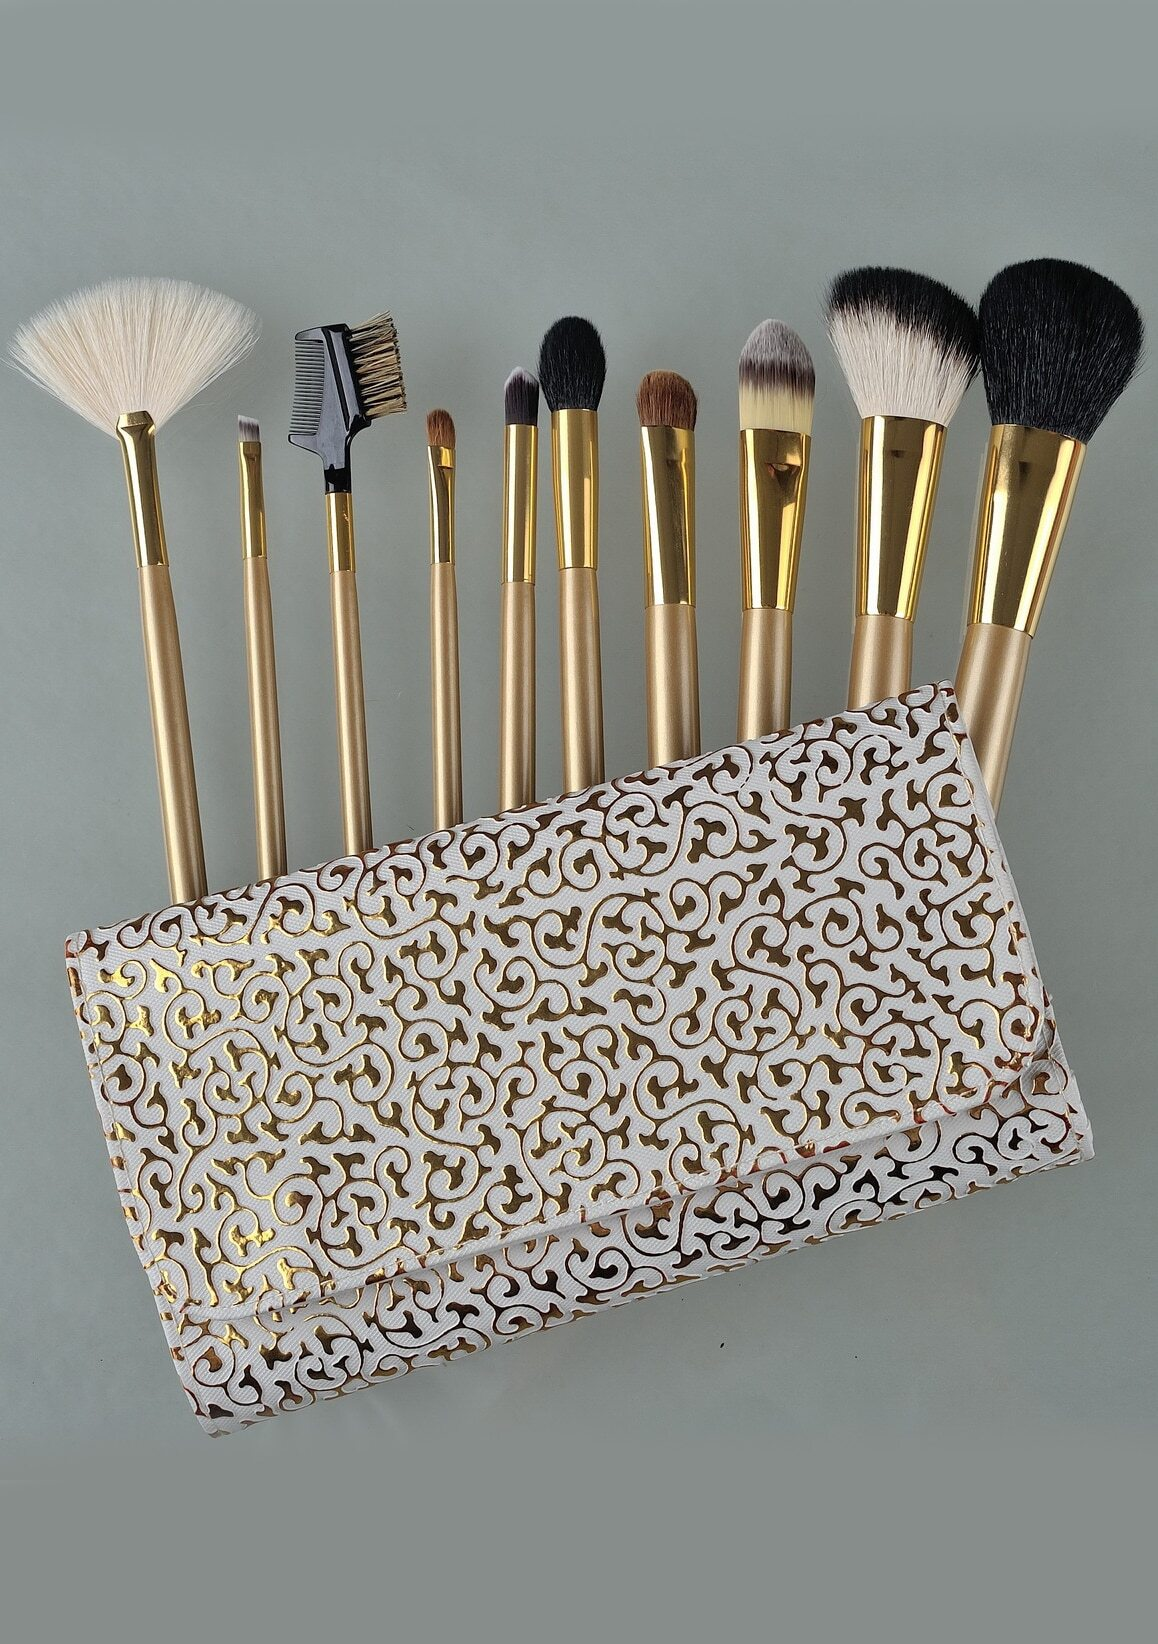 10pcs Professional Makeup Brushes Set Beauty Make Up Brush Set-Gold